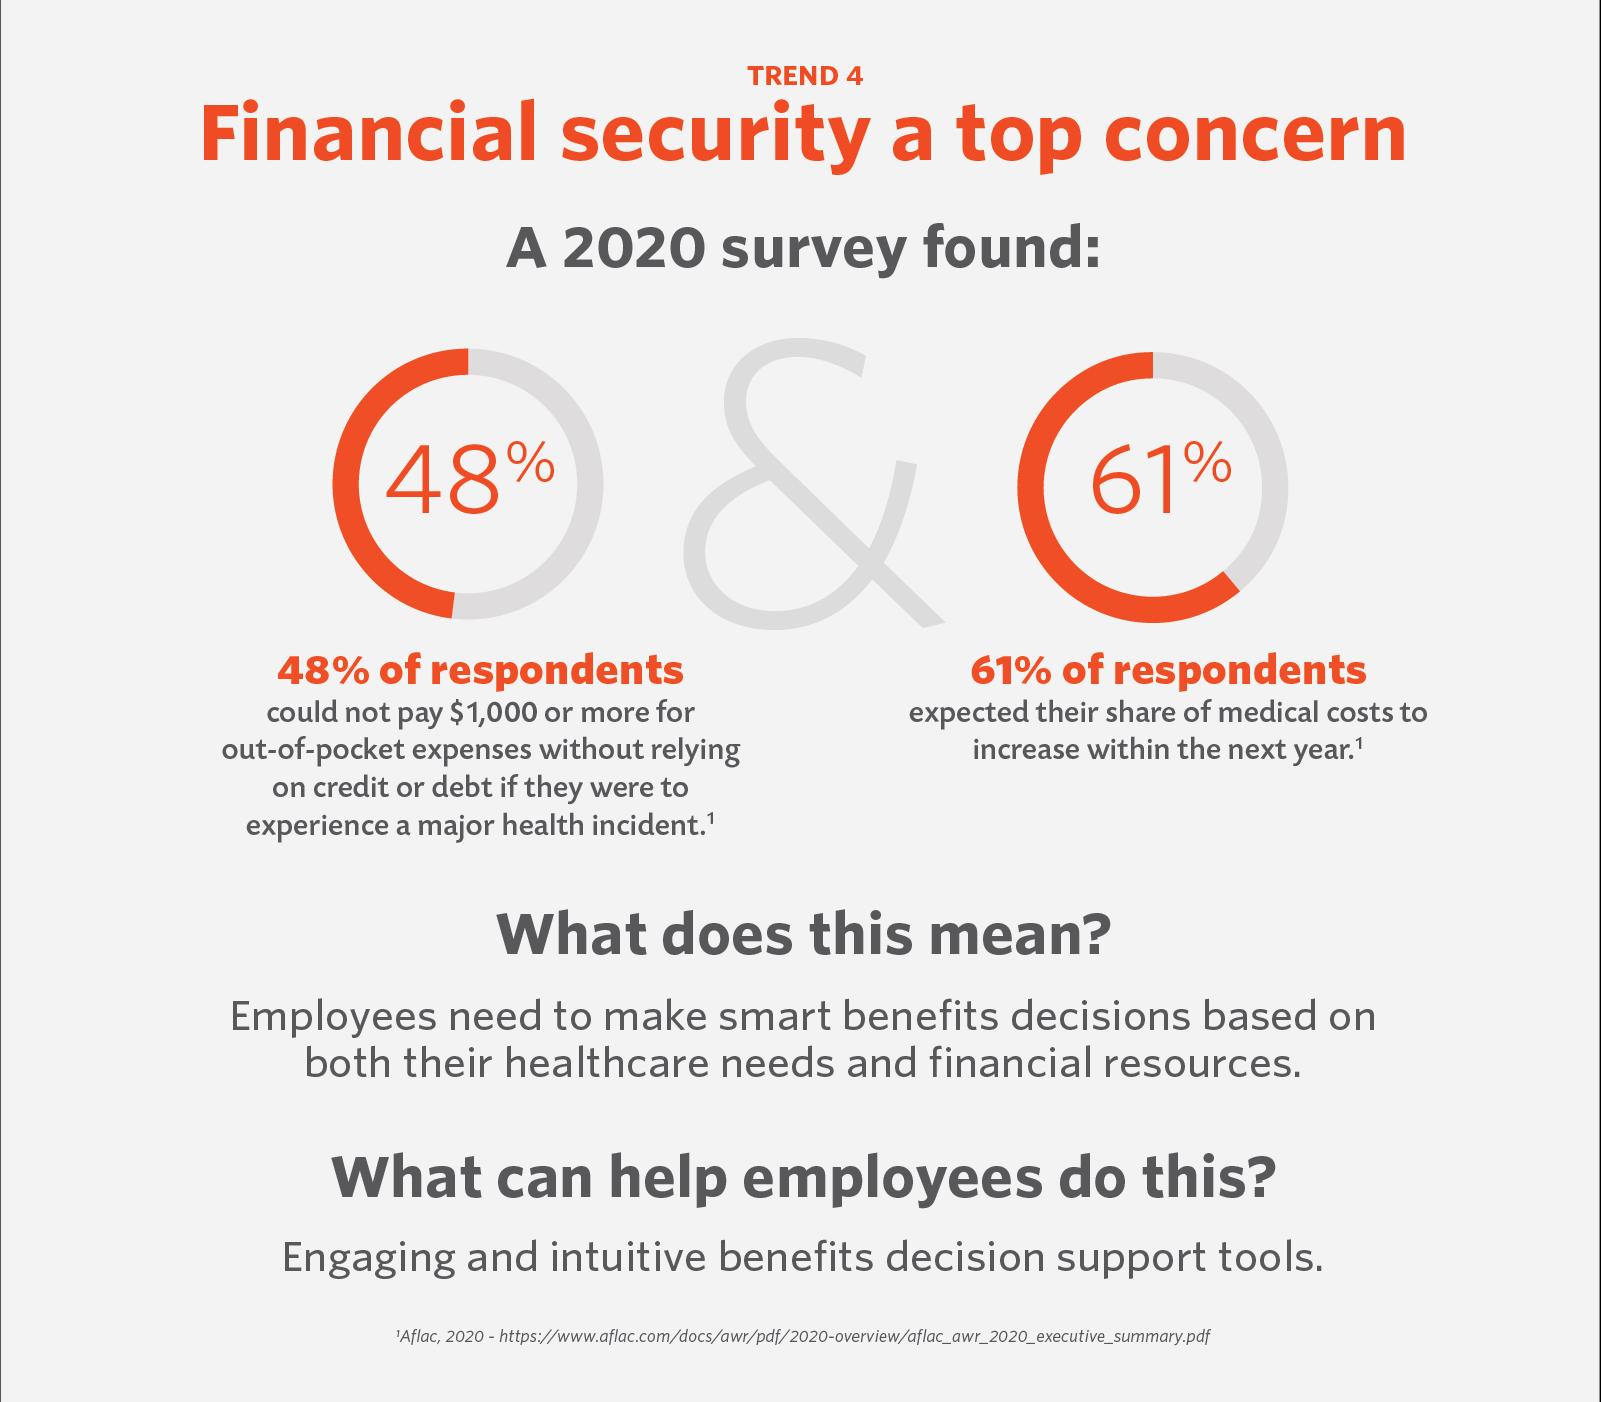 Trend 4 - Financial security a top concern